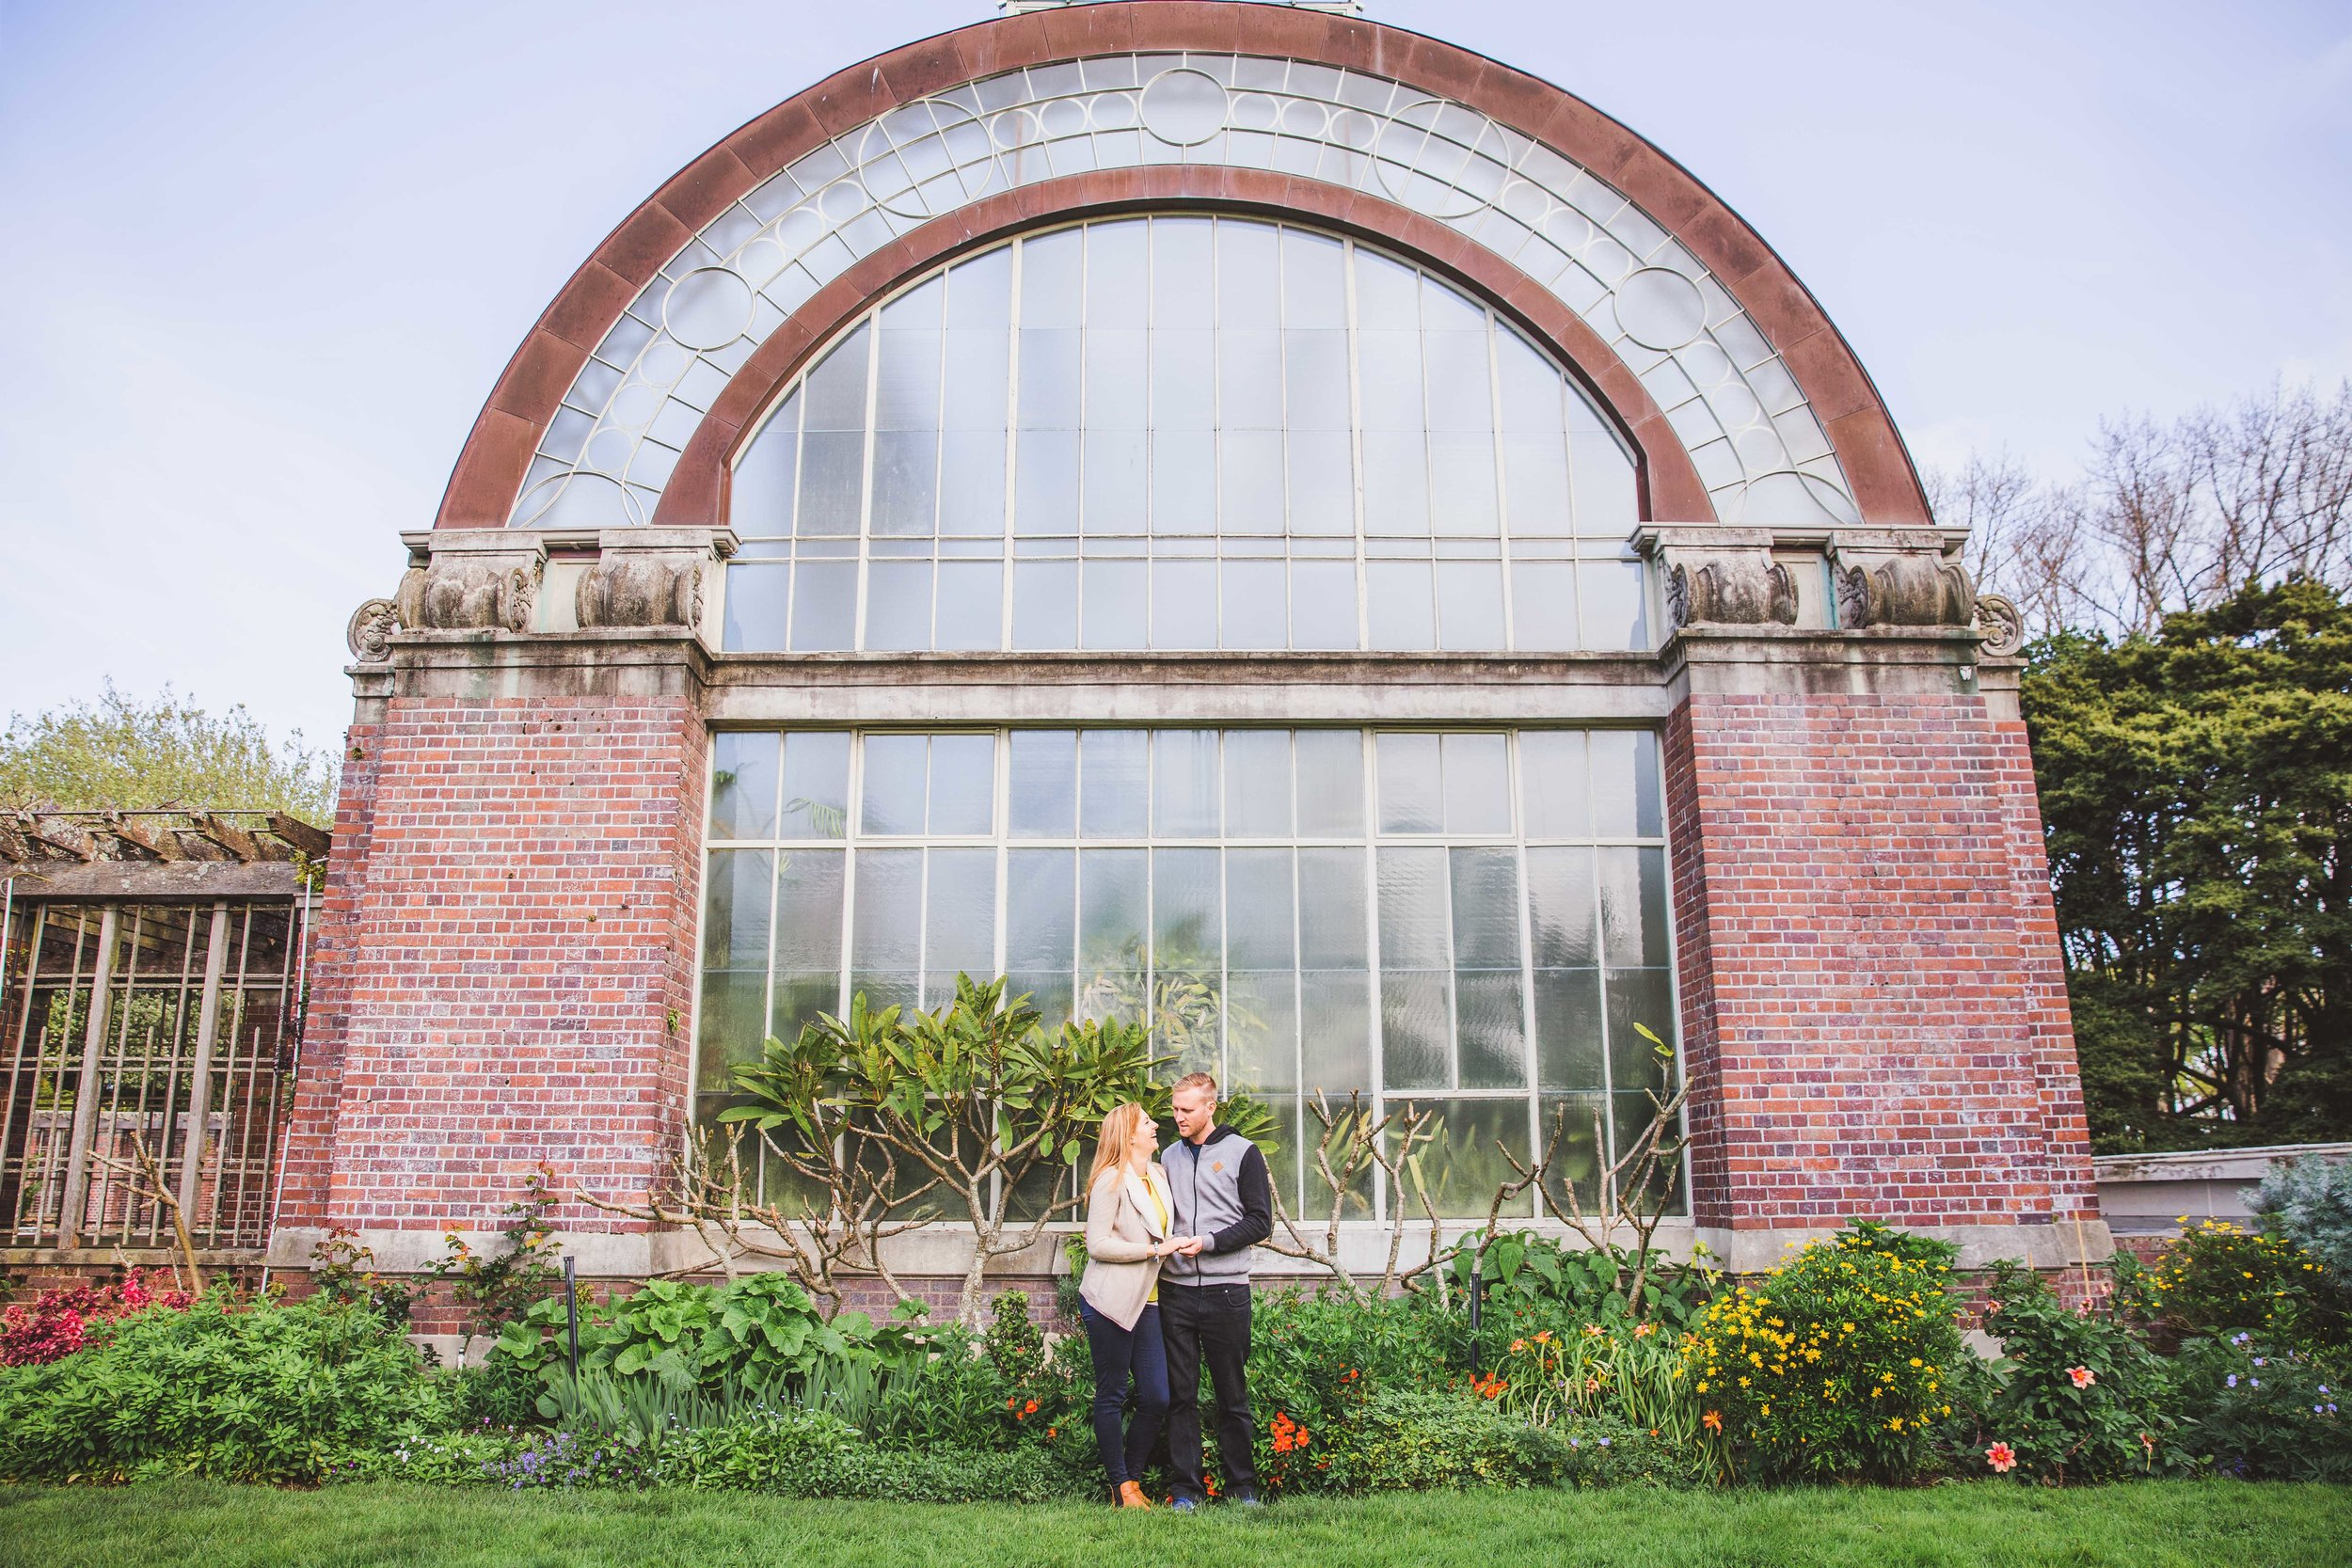 Wilson and Ashleigh - Auckland Winter Gardens engagement